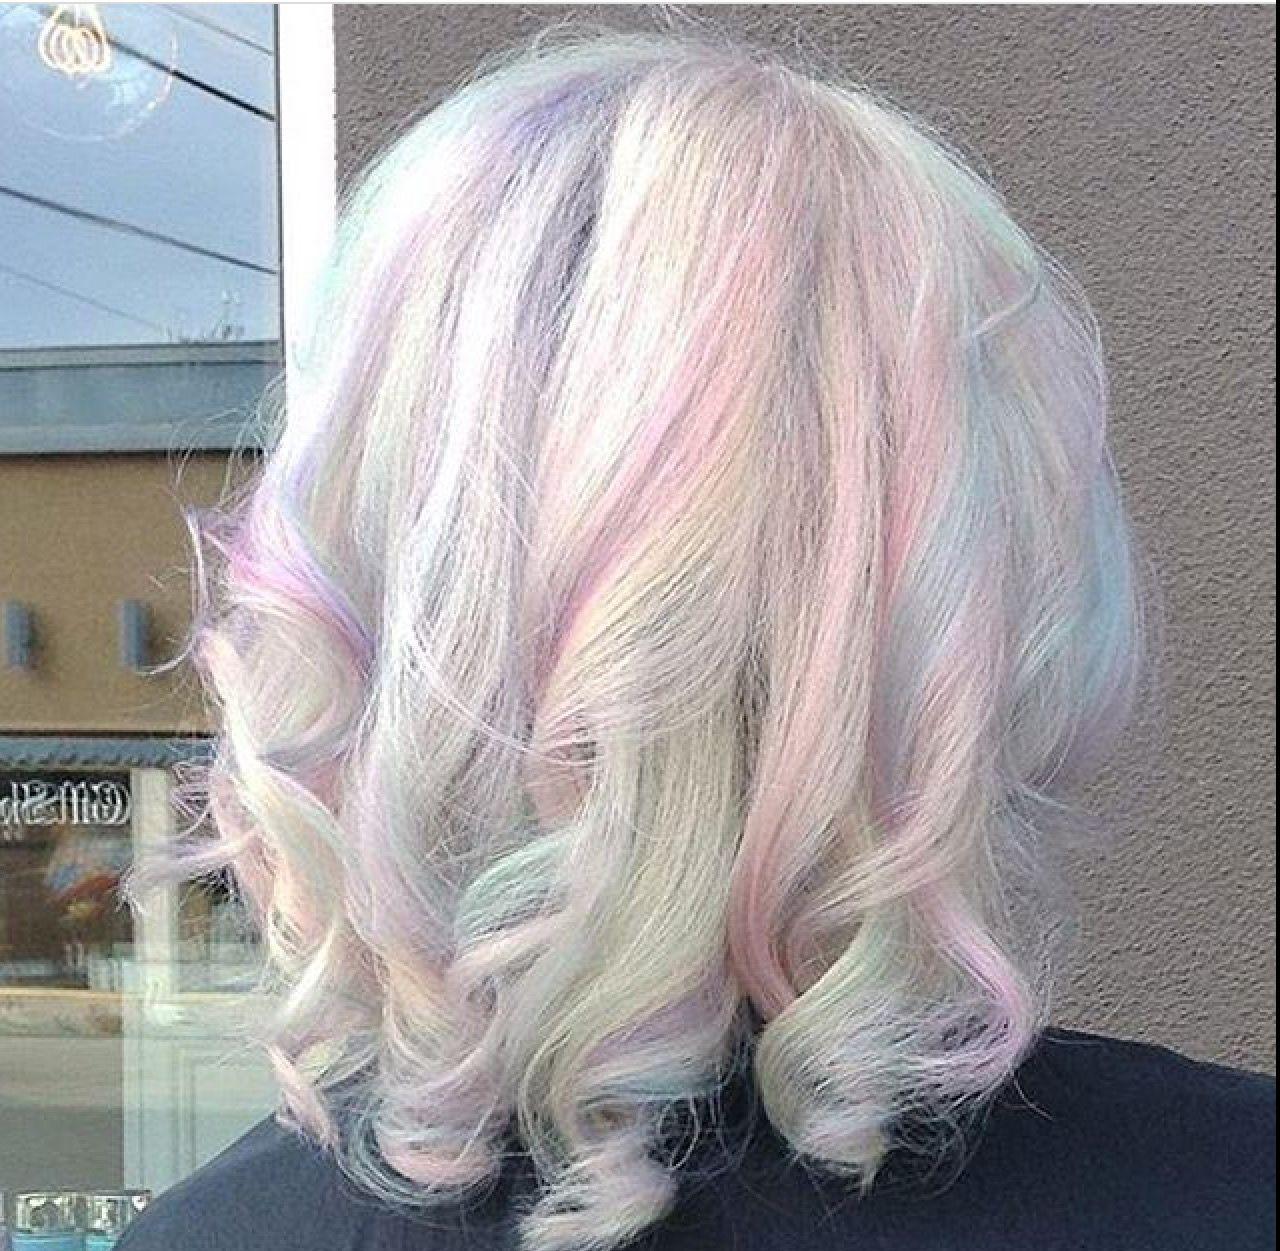 Pin by angela gaitan utrilla on peinados pinterest hair coloring